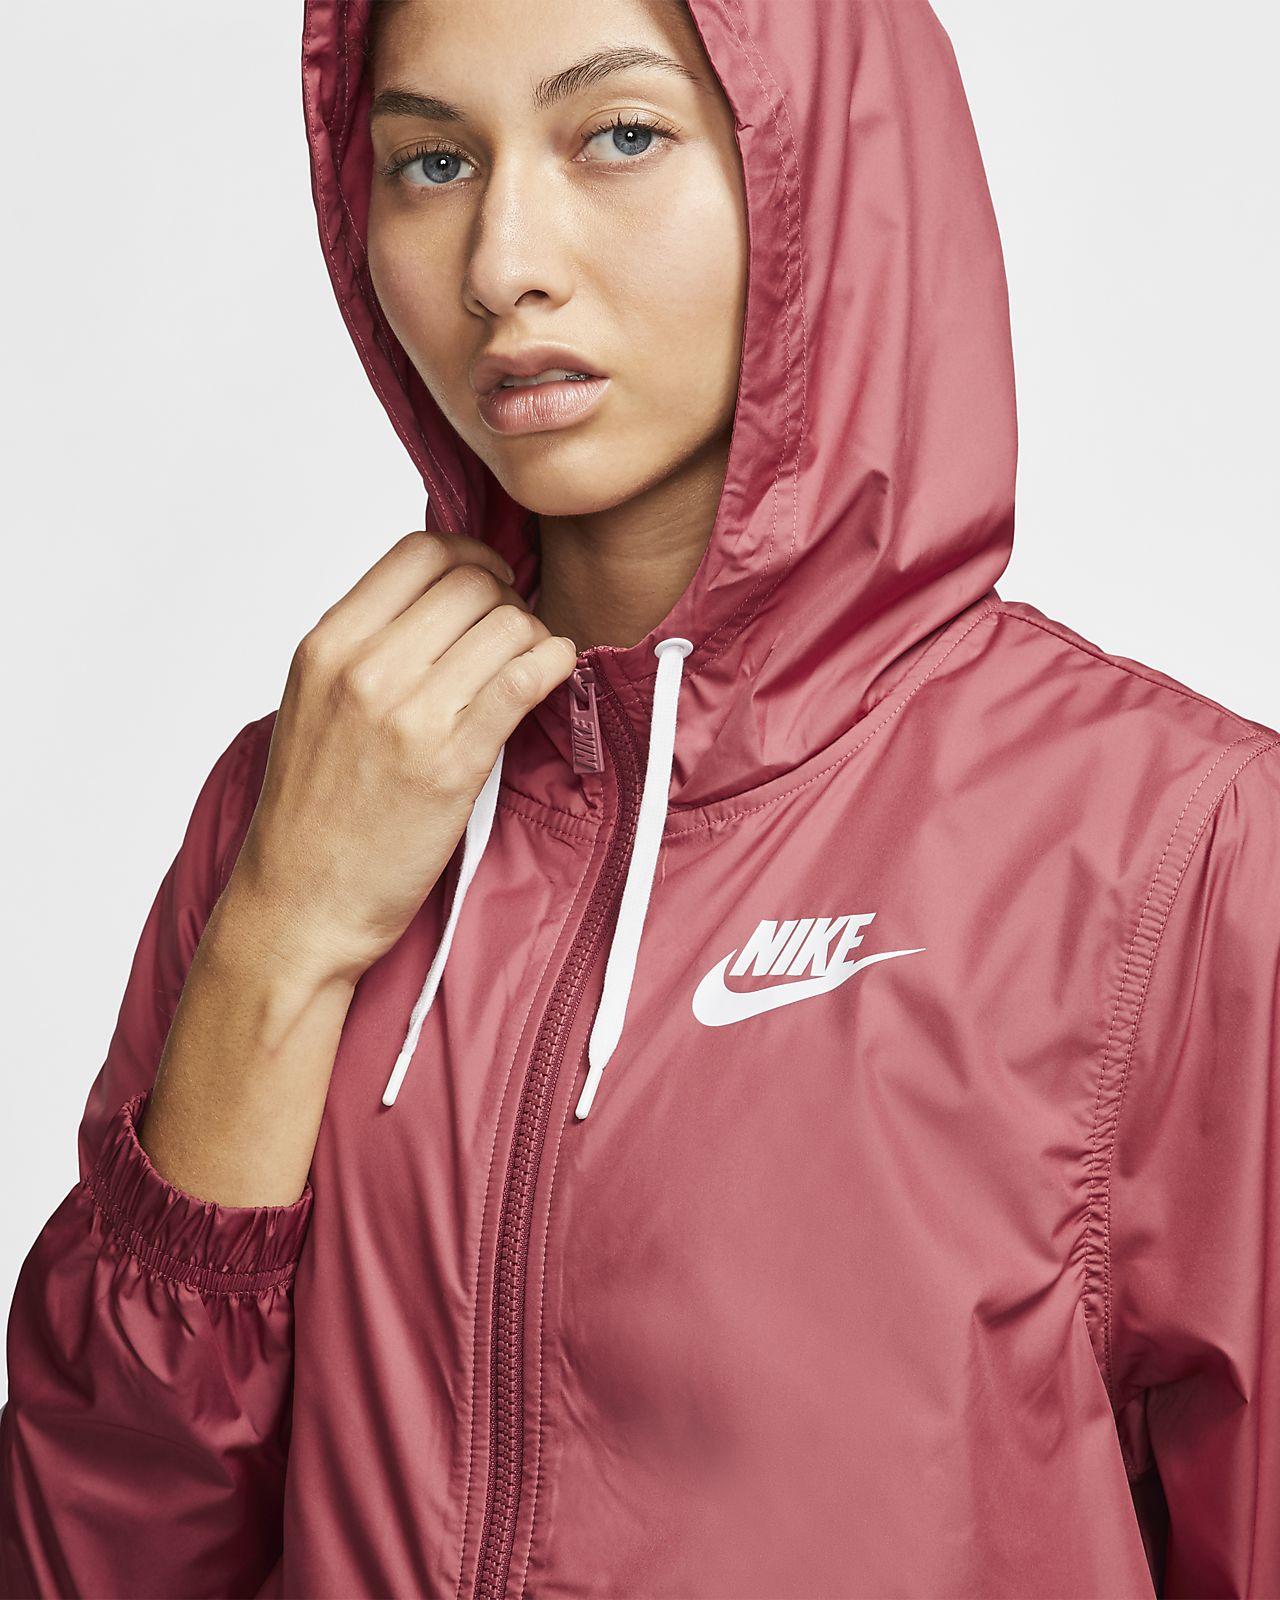 Webmaterial Damenjacke Sportswear Aus Sportswear Nike Webmaterial Damenjacke Nike Nike Aus kXNO80wPnZ